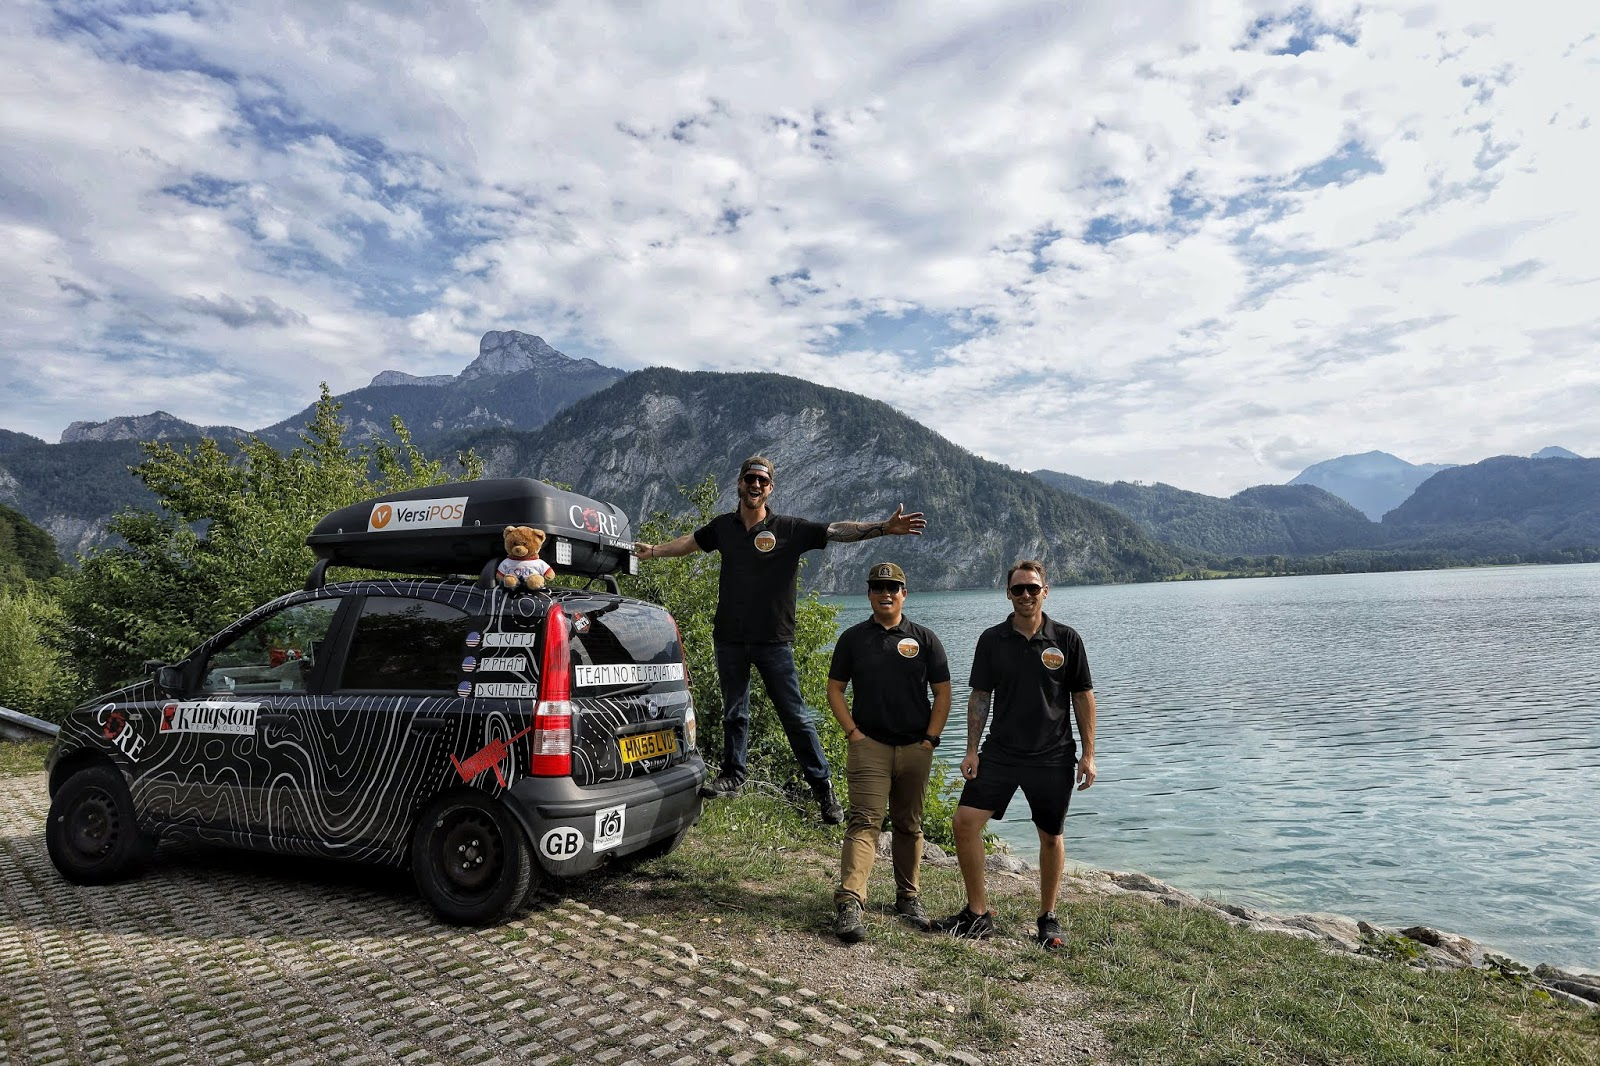 Kingston Technology apoya al equipo Team No Reservations en el Mongol Rally